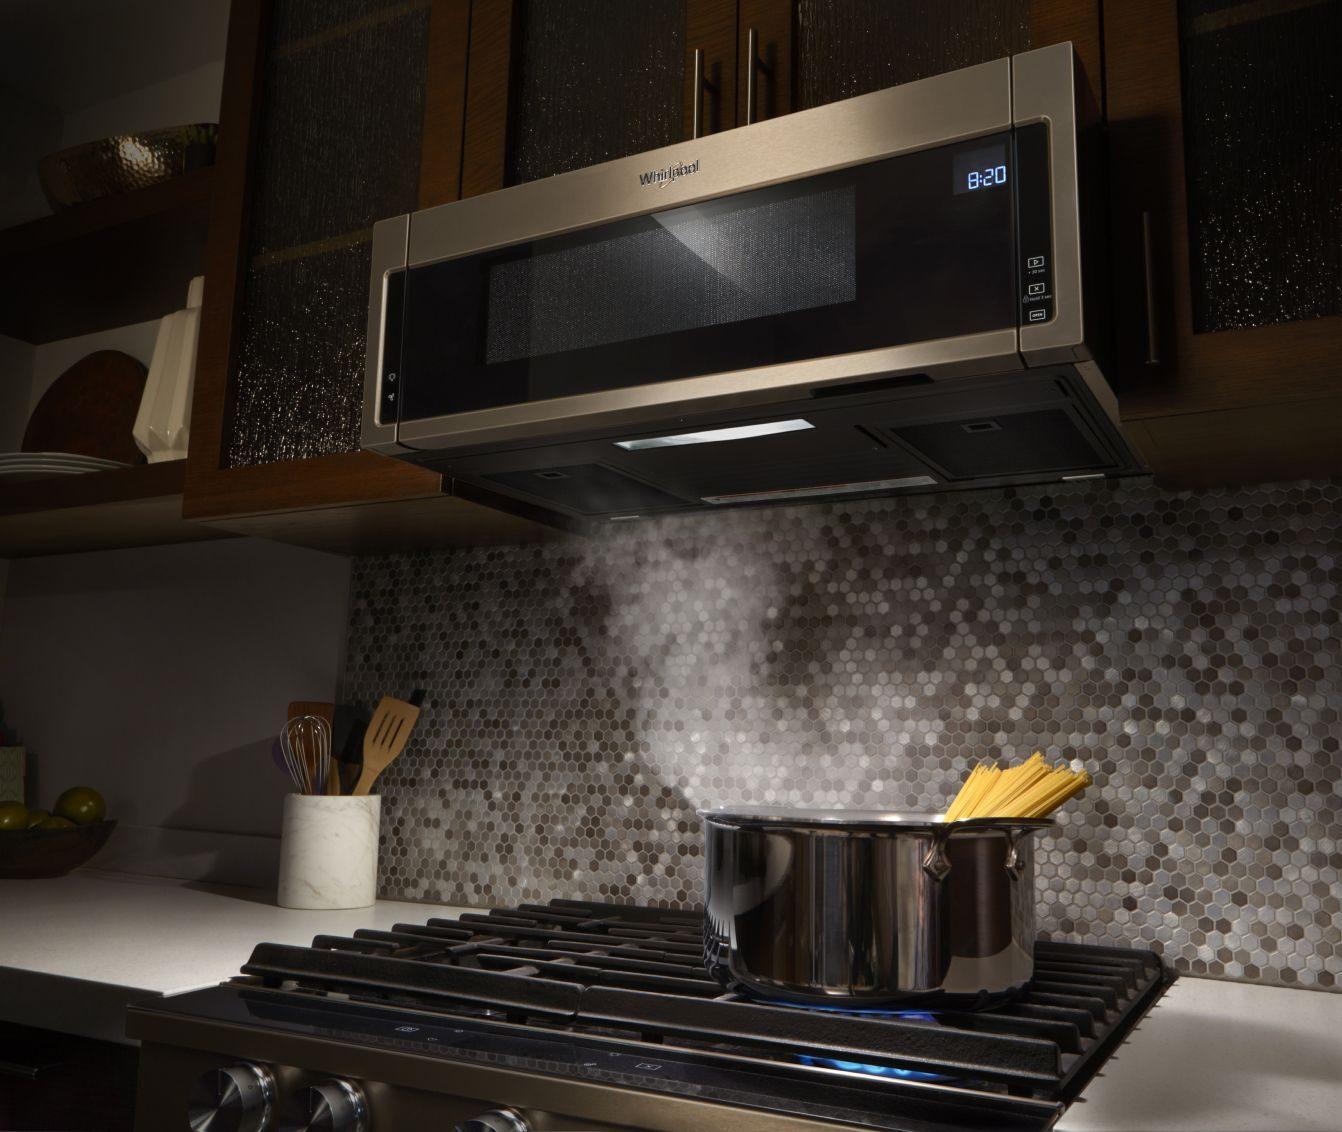 Under-Cabinet Range Hoods | Whirlpool on kitchen microwave cabinet ideas, kitchen oven cabinet ideas, kitchen refrigerator cabinet ideas, kitchen trash compactor cabinet ideas,